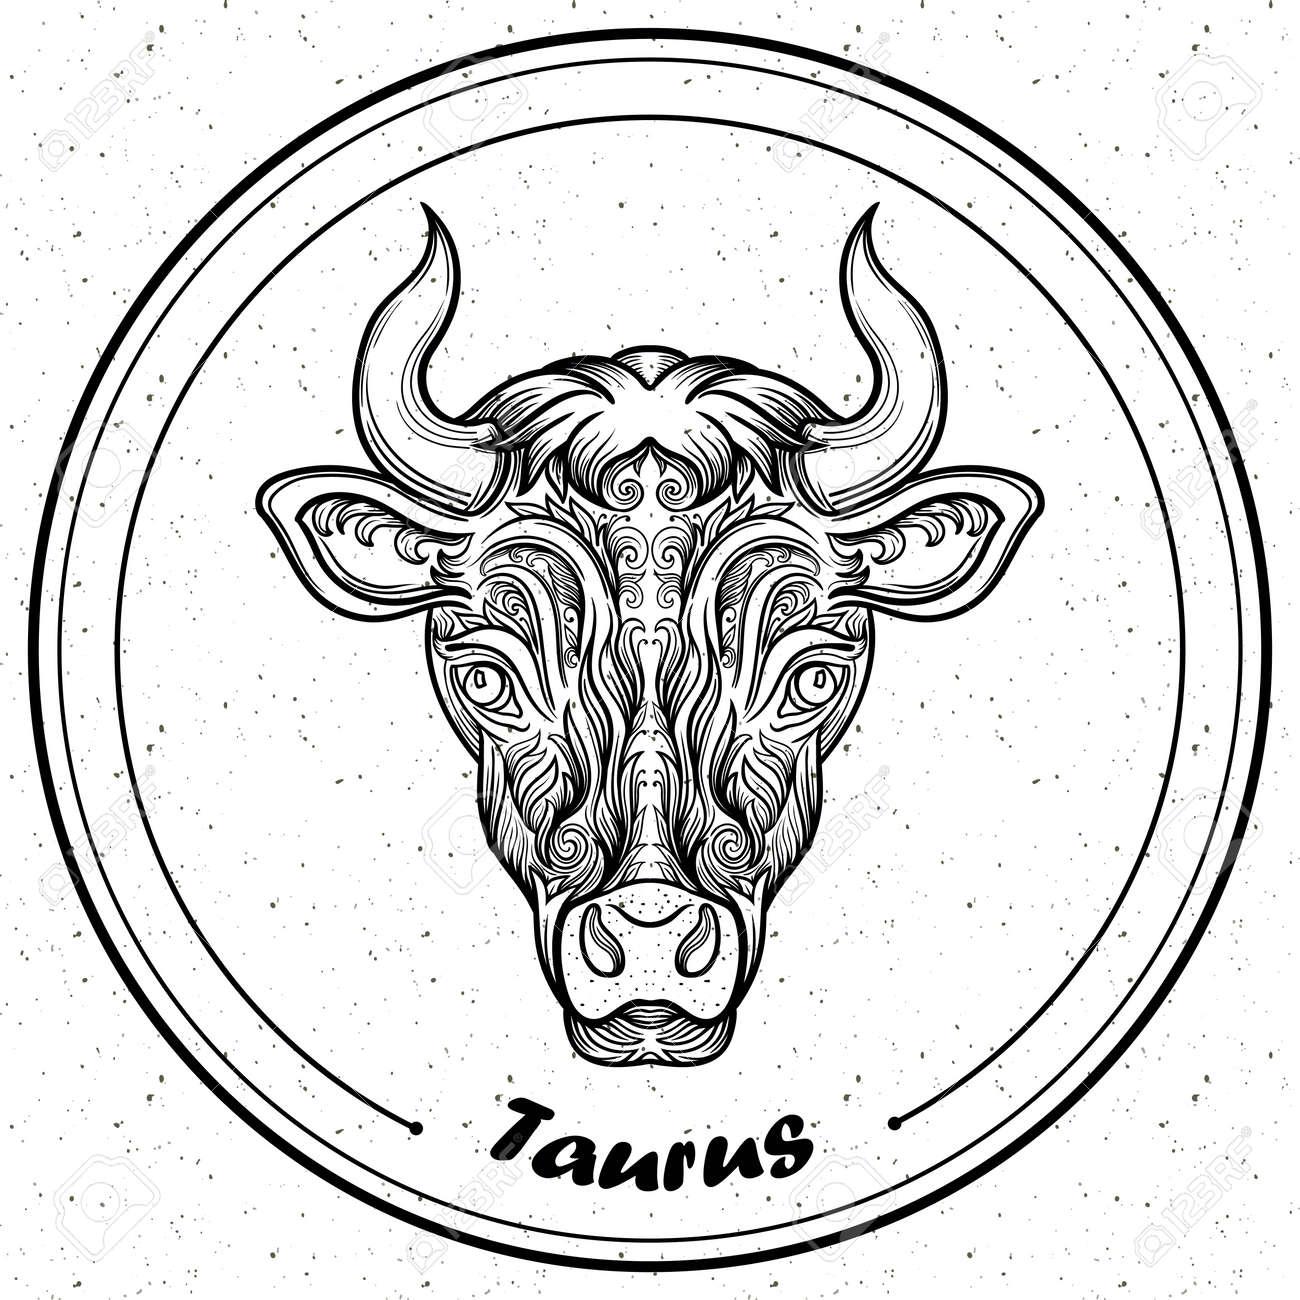 Tauro Detallada En Línea Estilo Del Arte De Filigrana Azteca